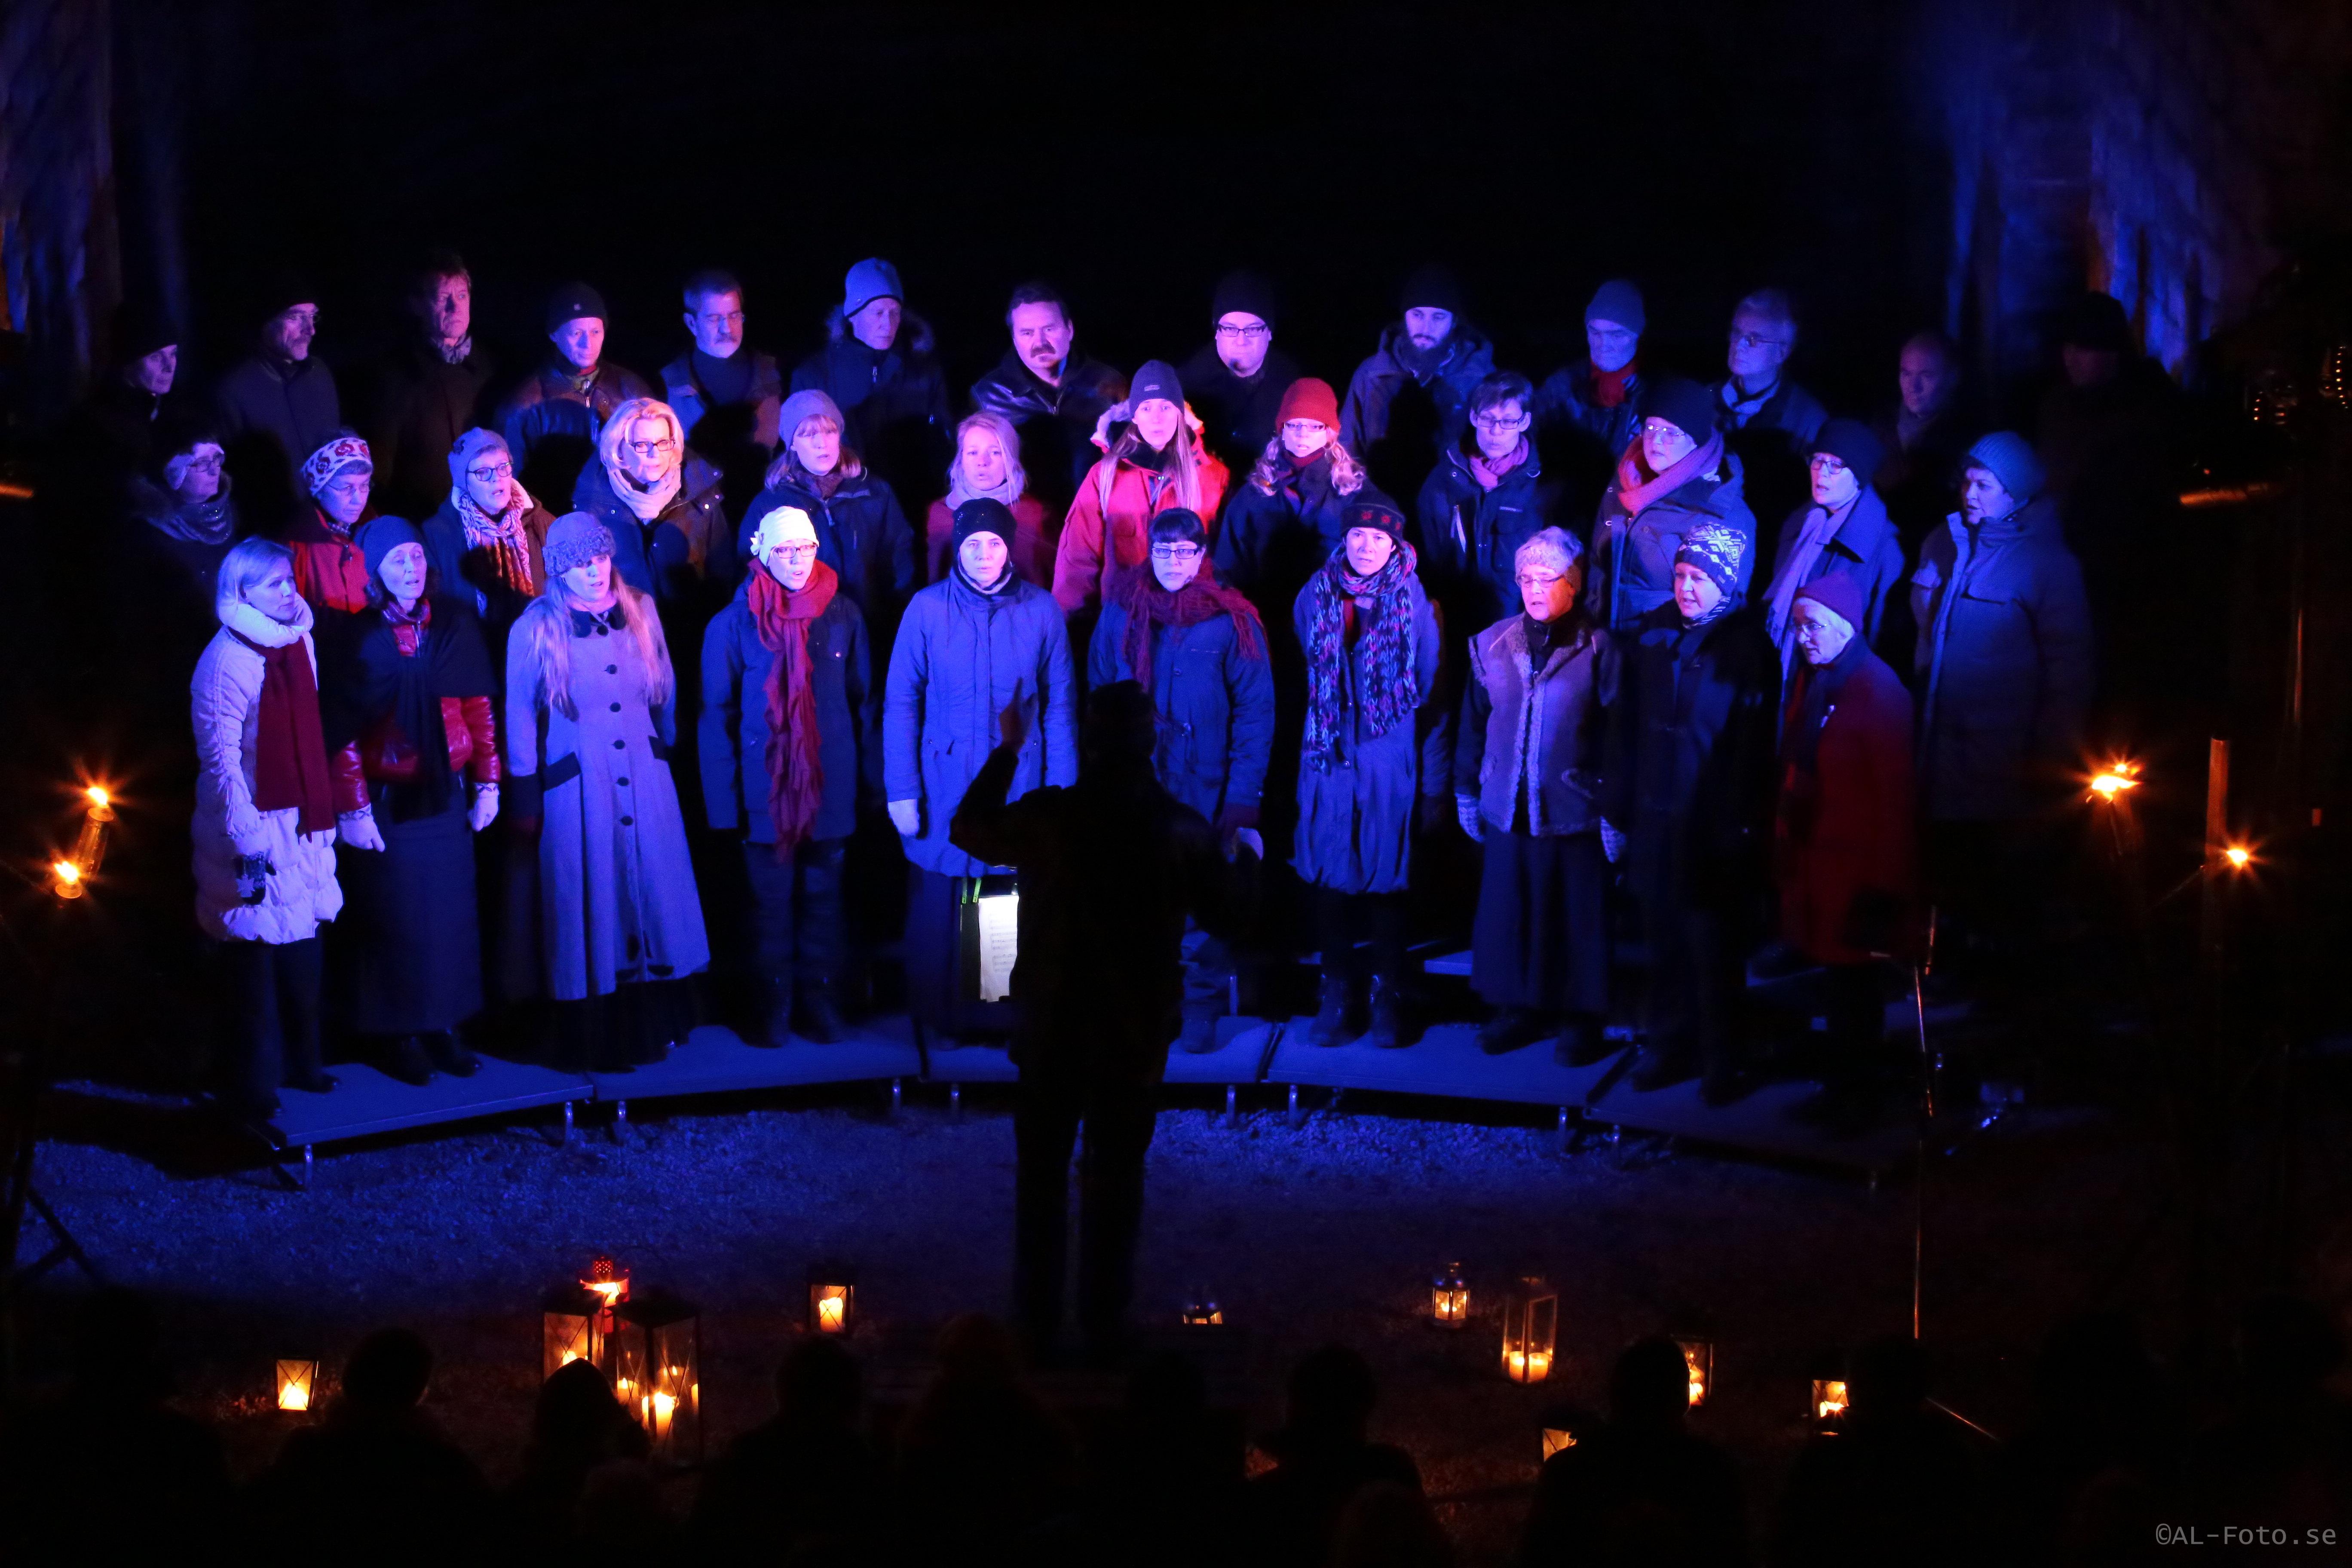 St Lars i november 2013. Foto: Andreas Landquist